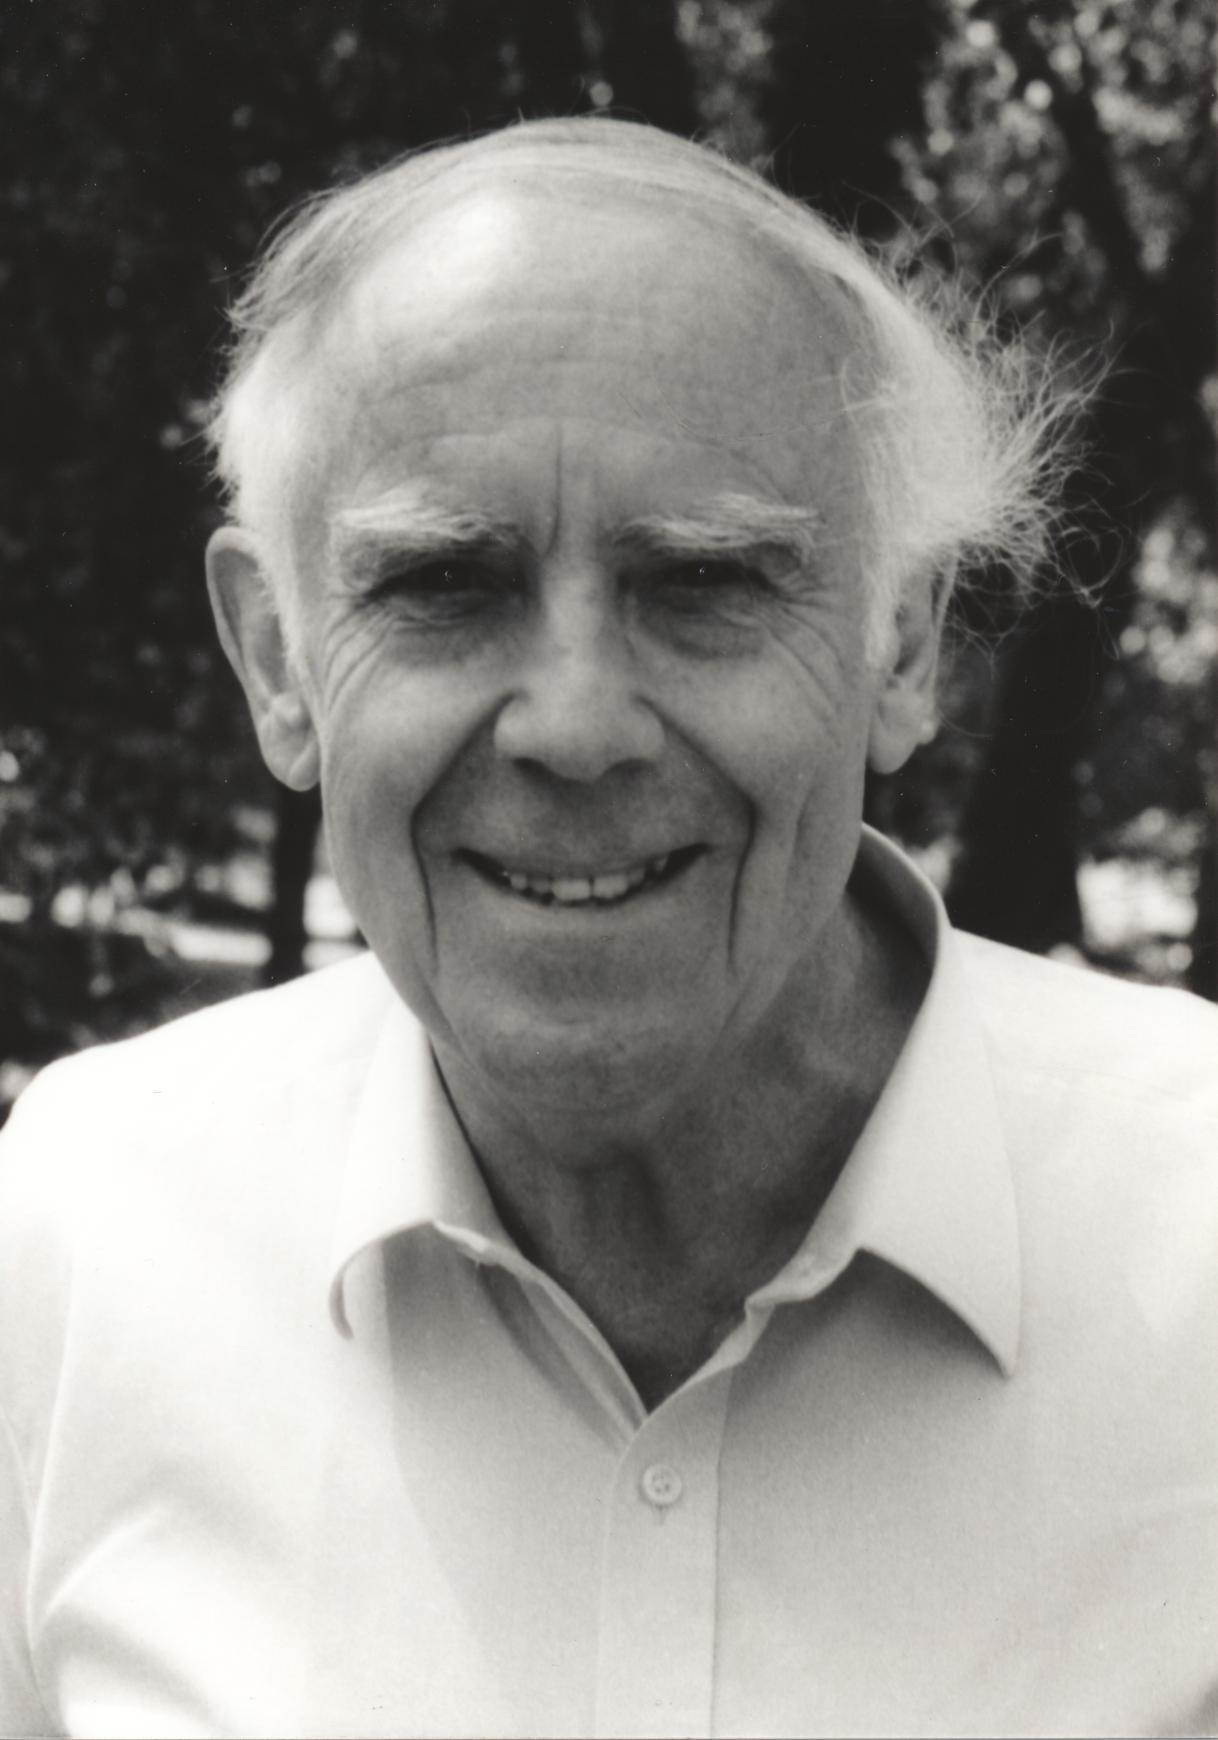 XIV. Imago Mundi-Kongress 1993, Innsbruck, Dr. Karl Suter FMH